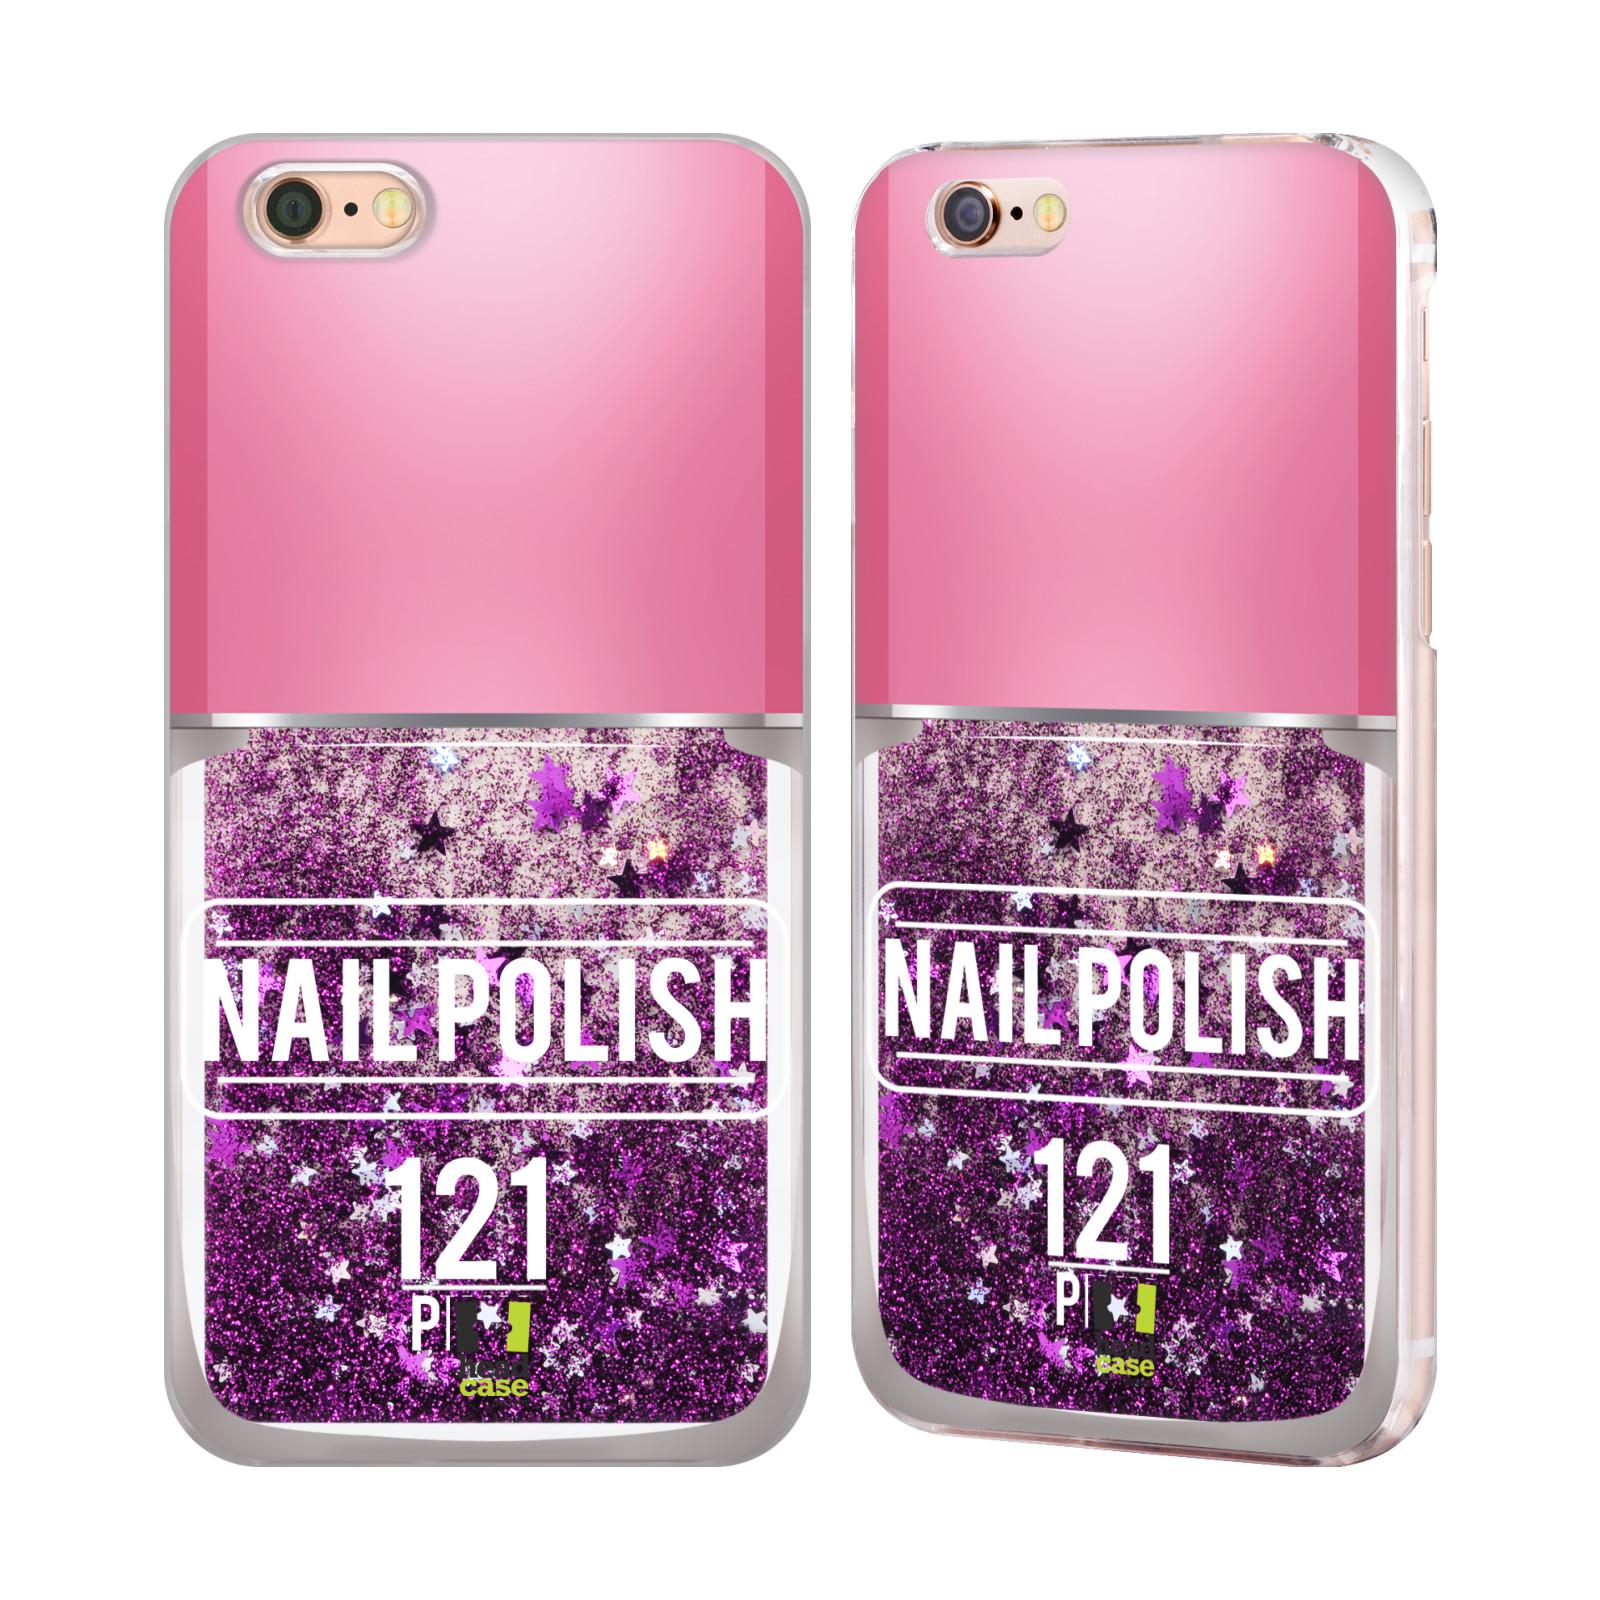 Marble Nail Polish Phone Case: HEAD CASE NAIL POLISH PURPLE LIQUID GLITTER CASE FOR APPLE